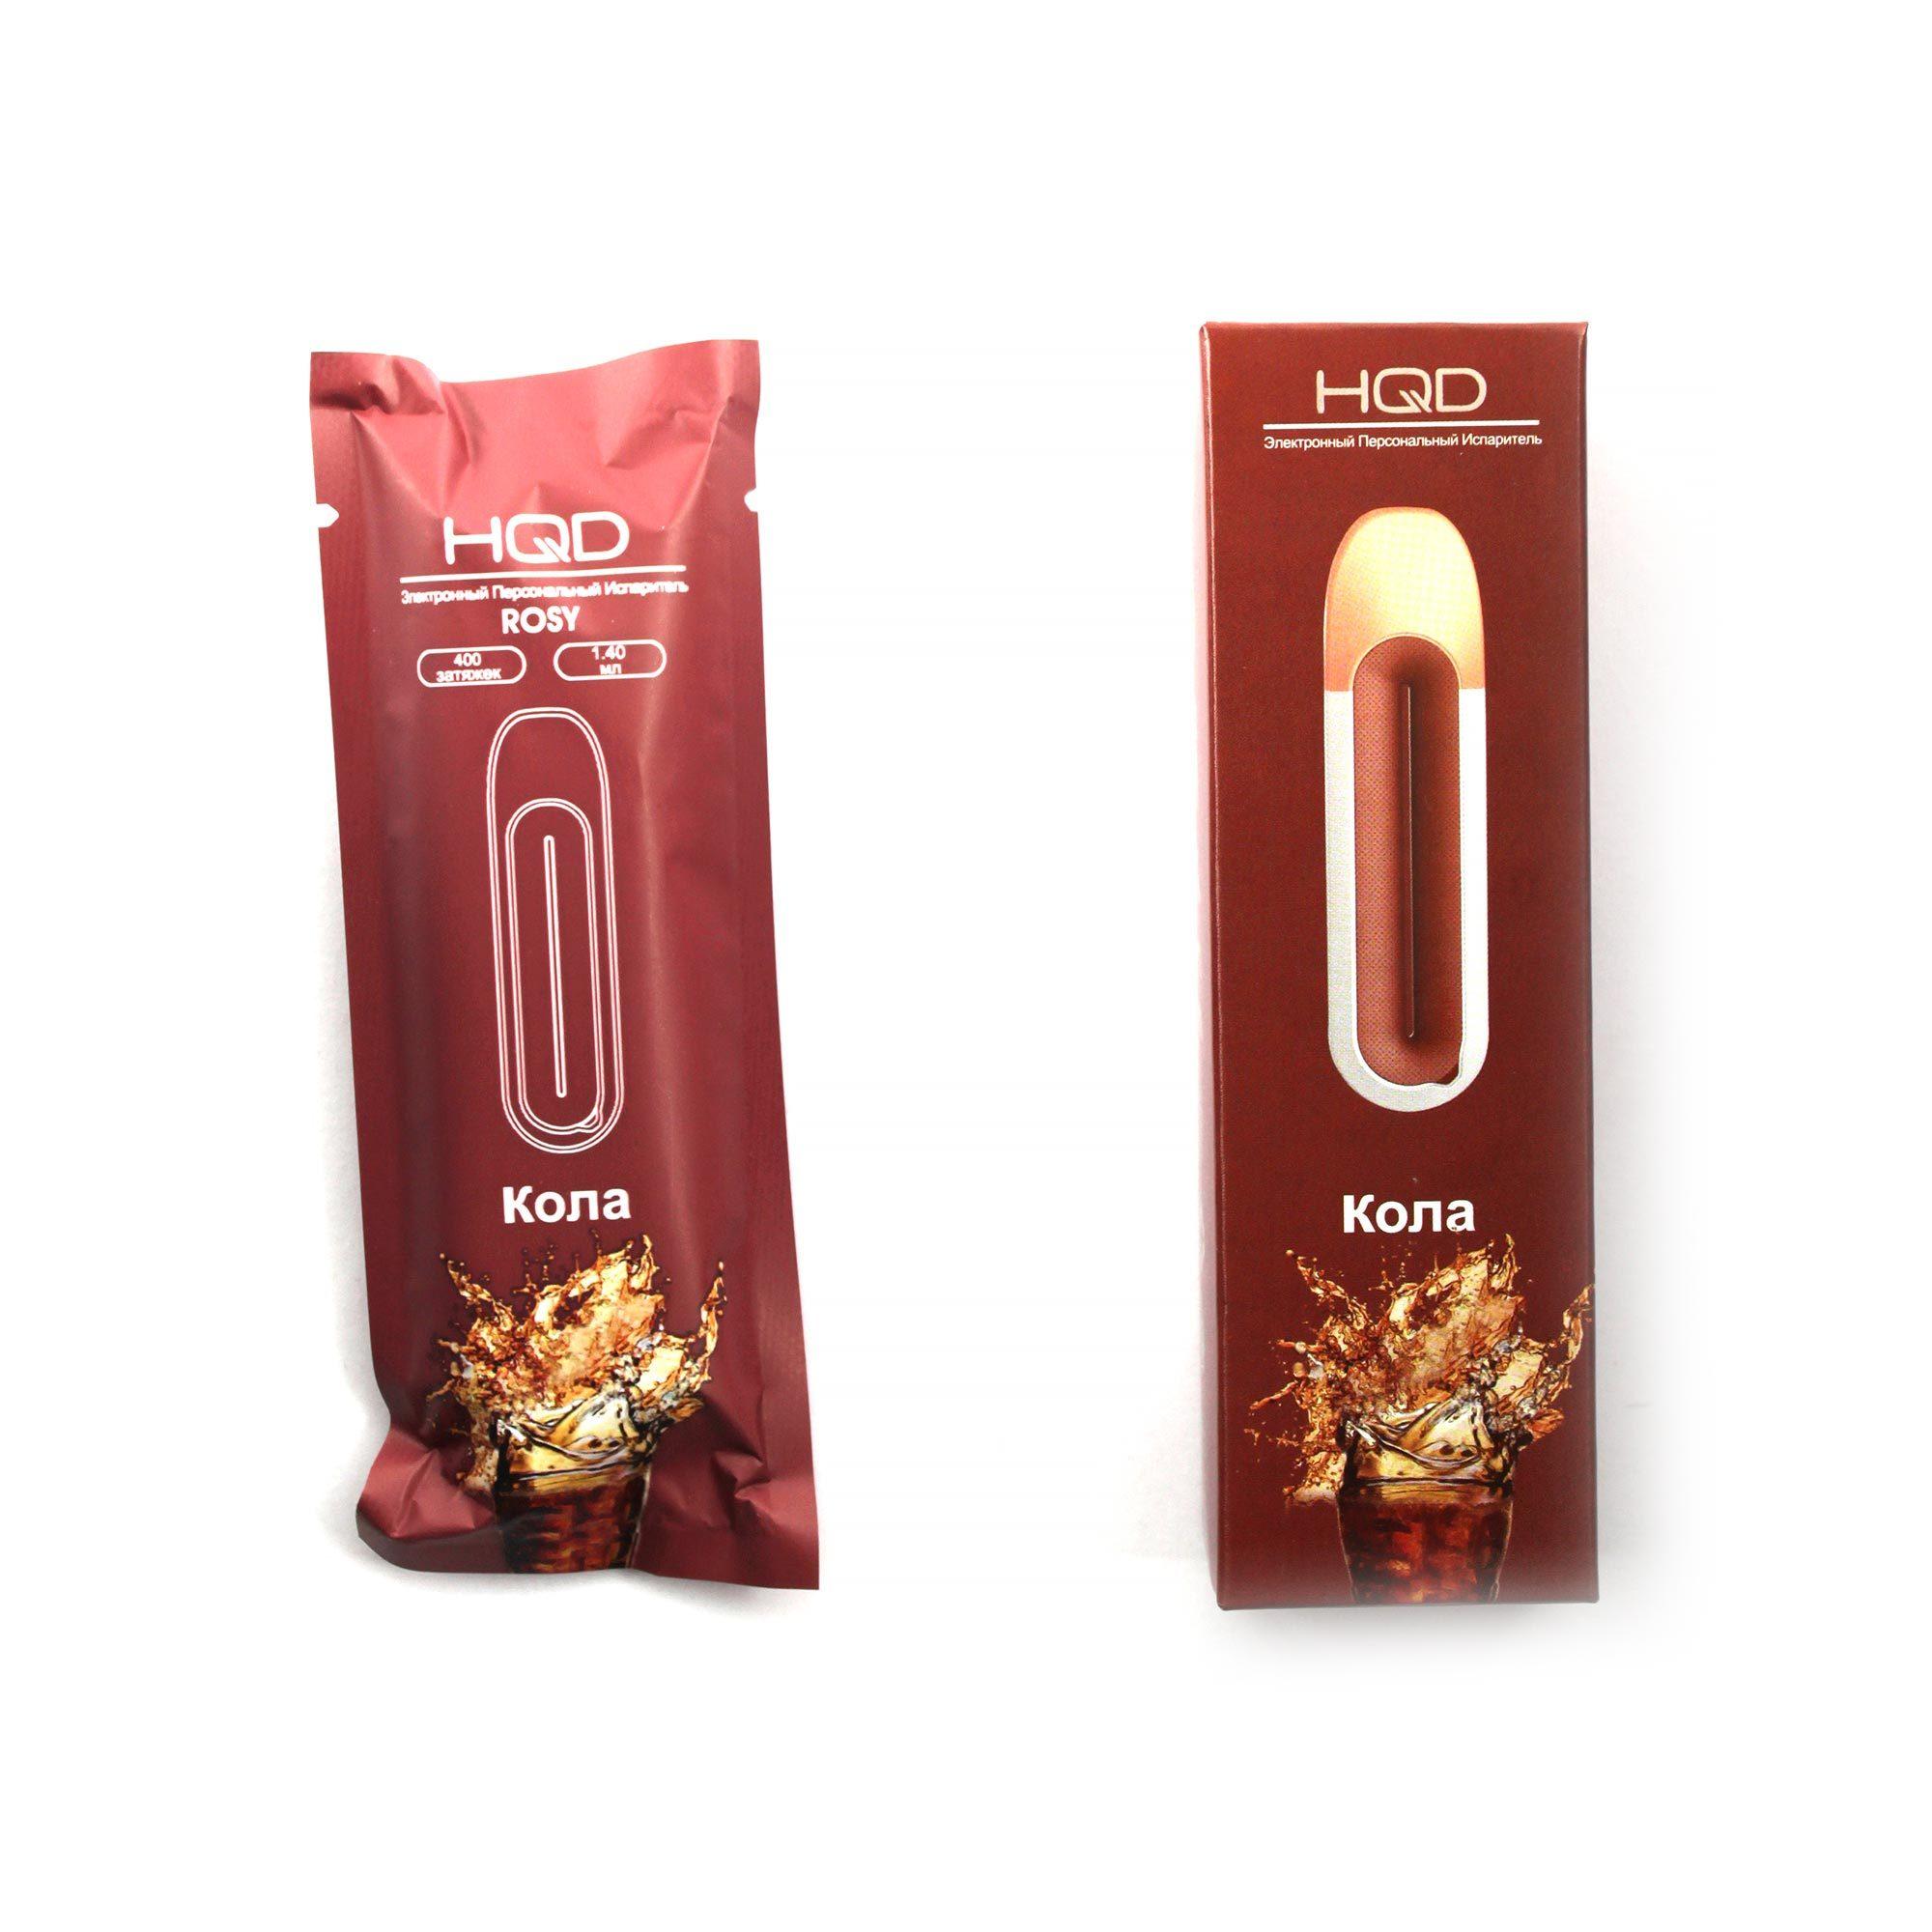 Одноразовая электронная сигарета HQD Rosy Cola (Кола)